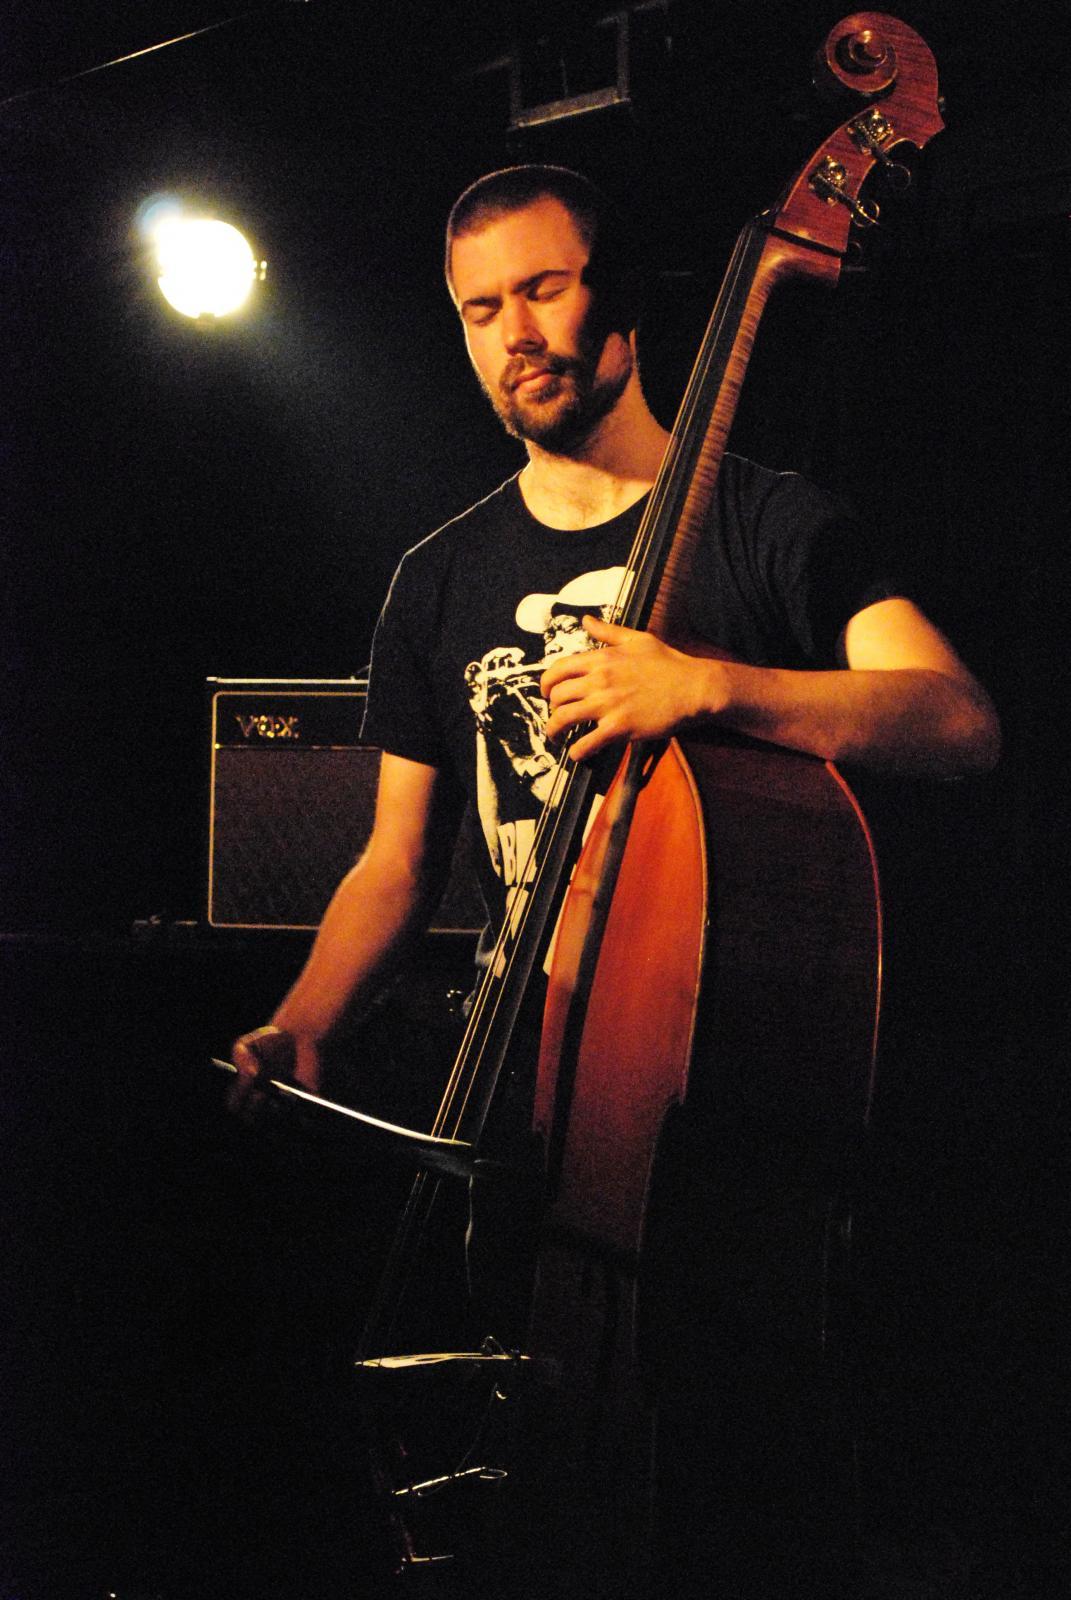 Christian Meaas Svendsen - Polish tour